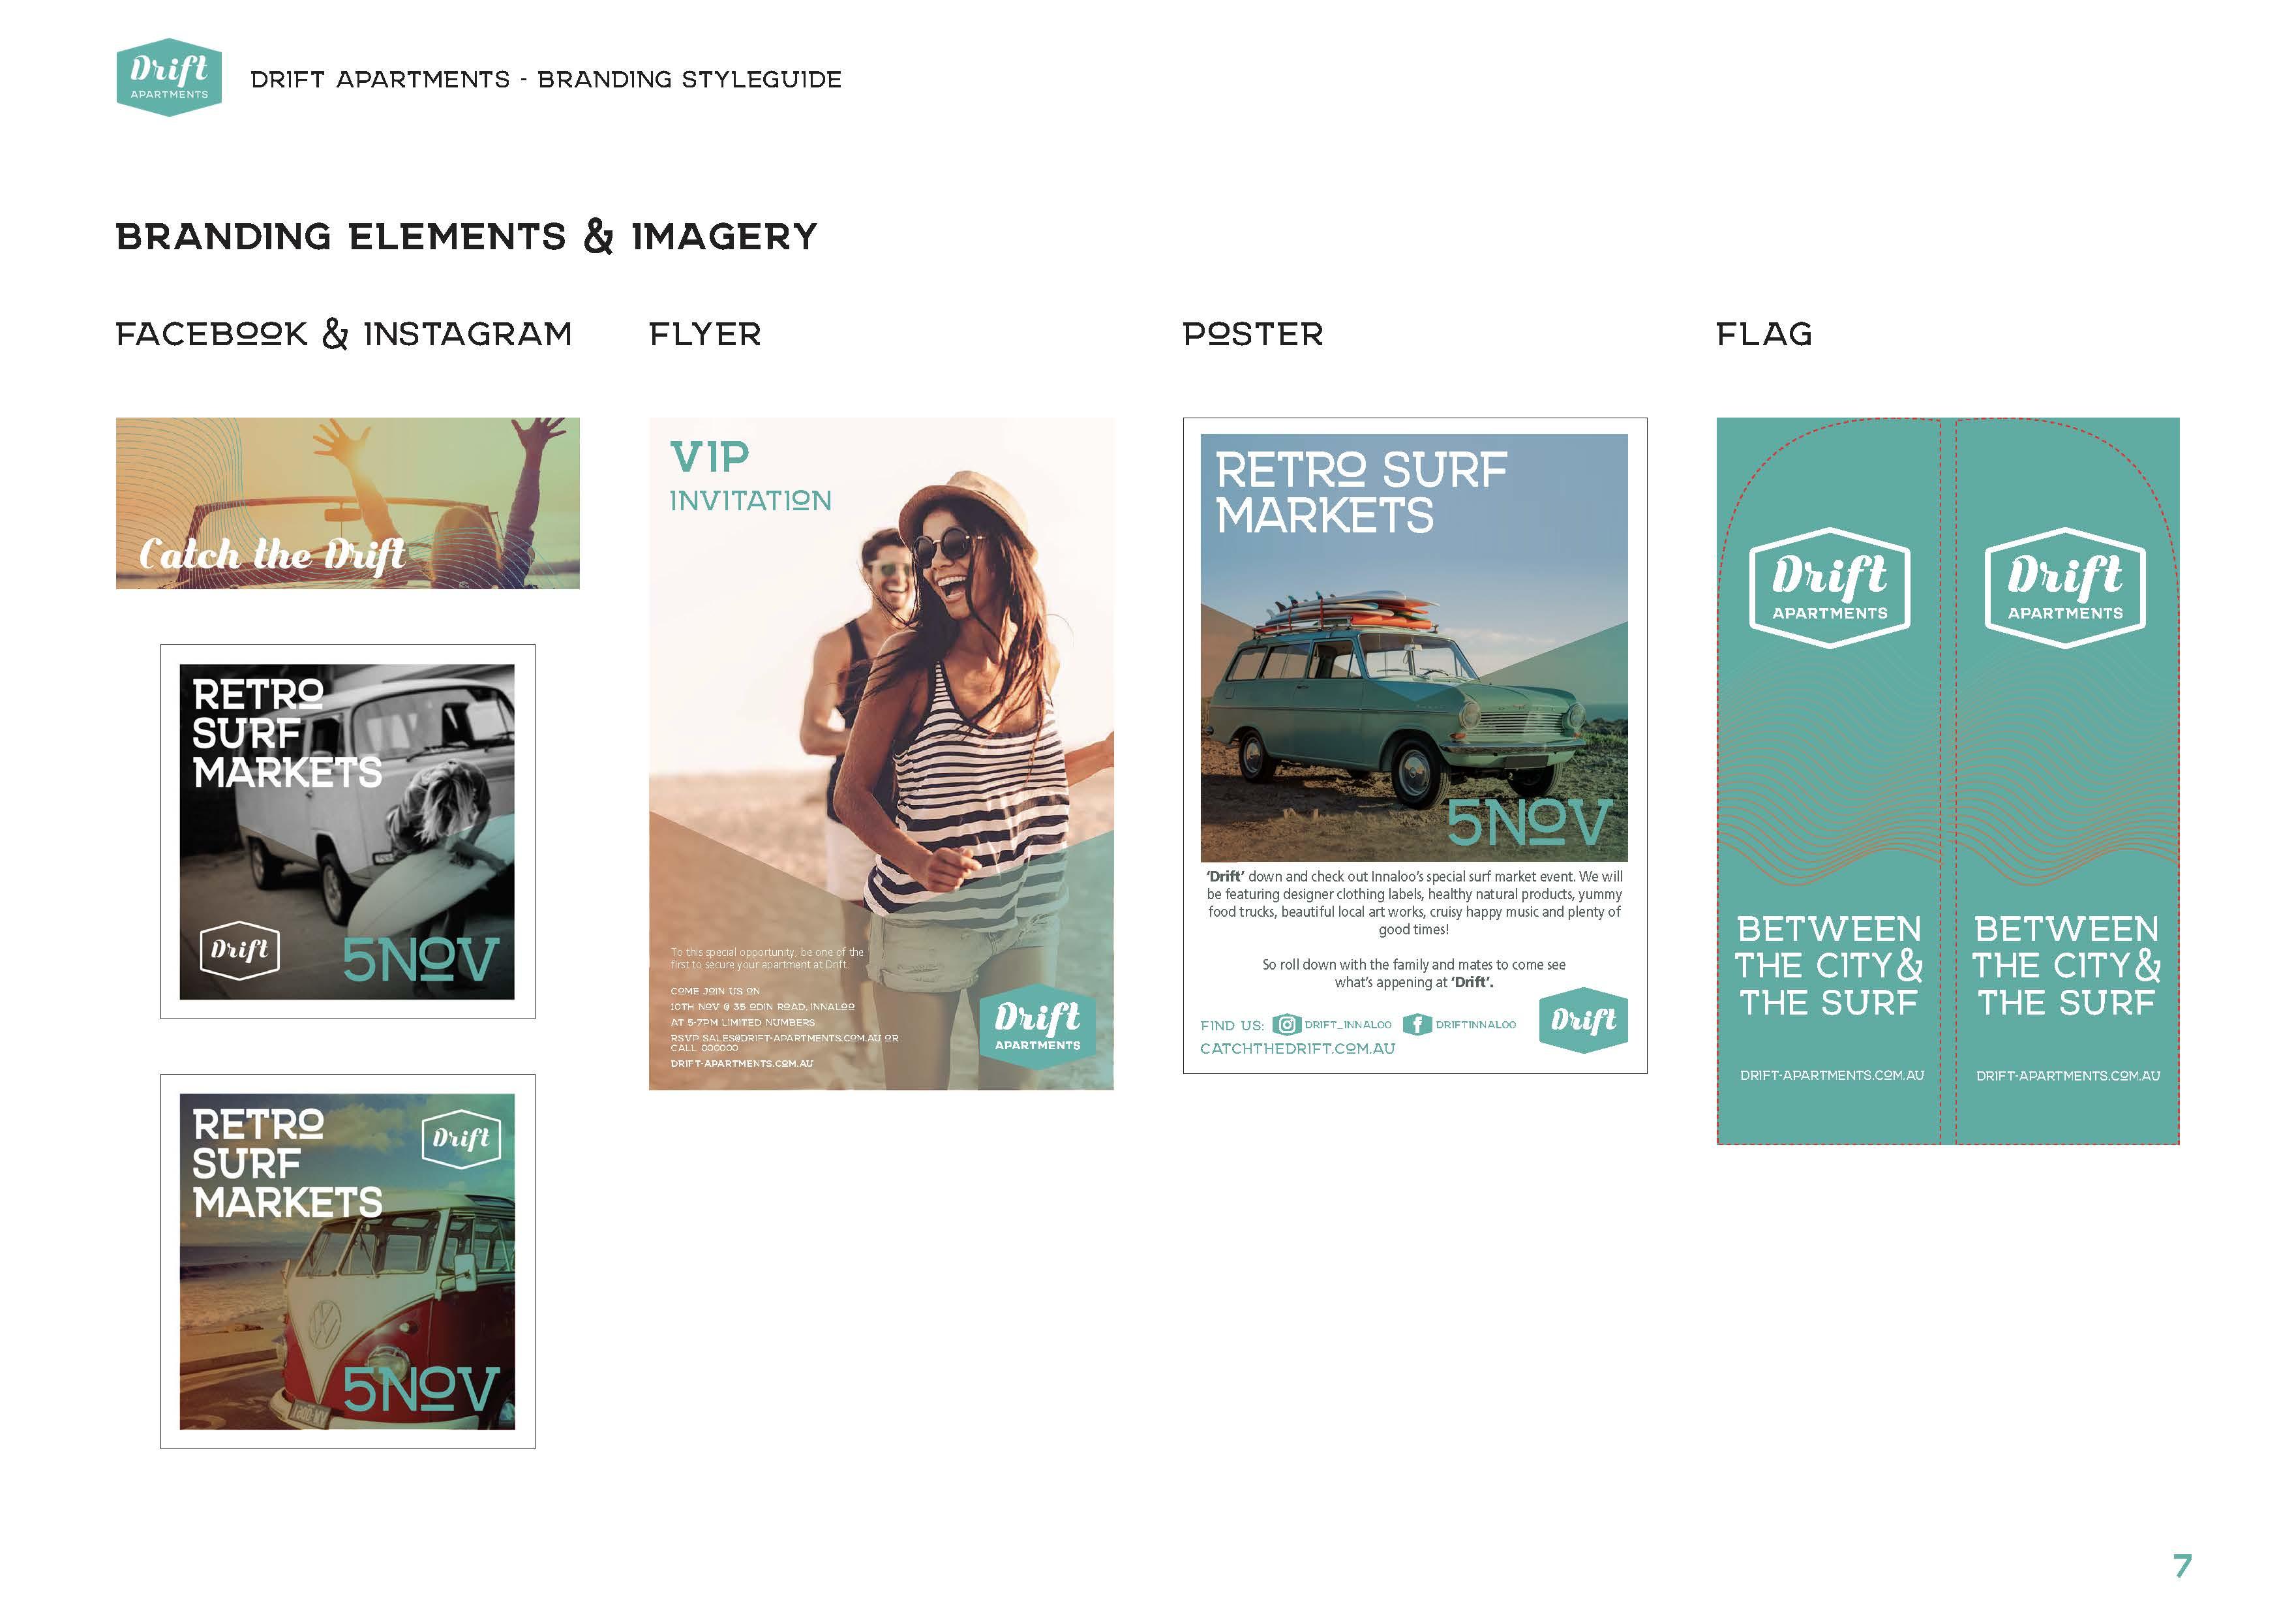 DA_Branding Styleguide_new_Page_7